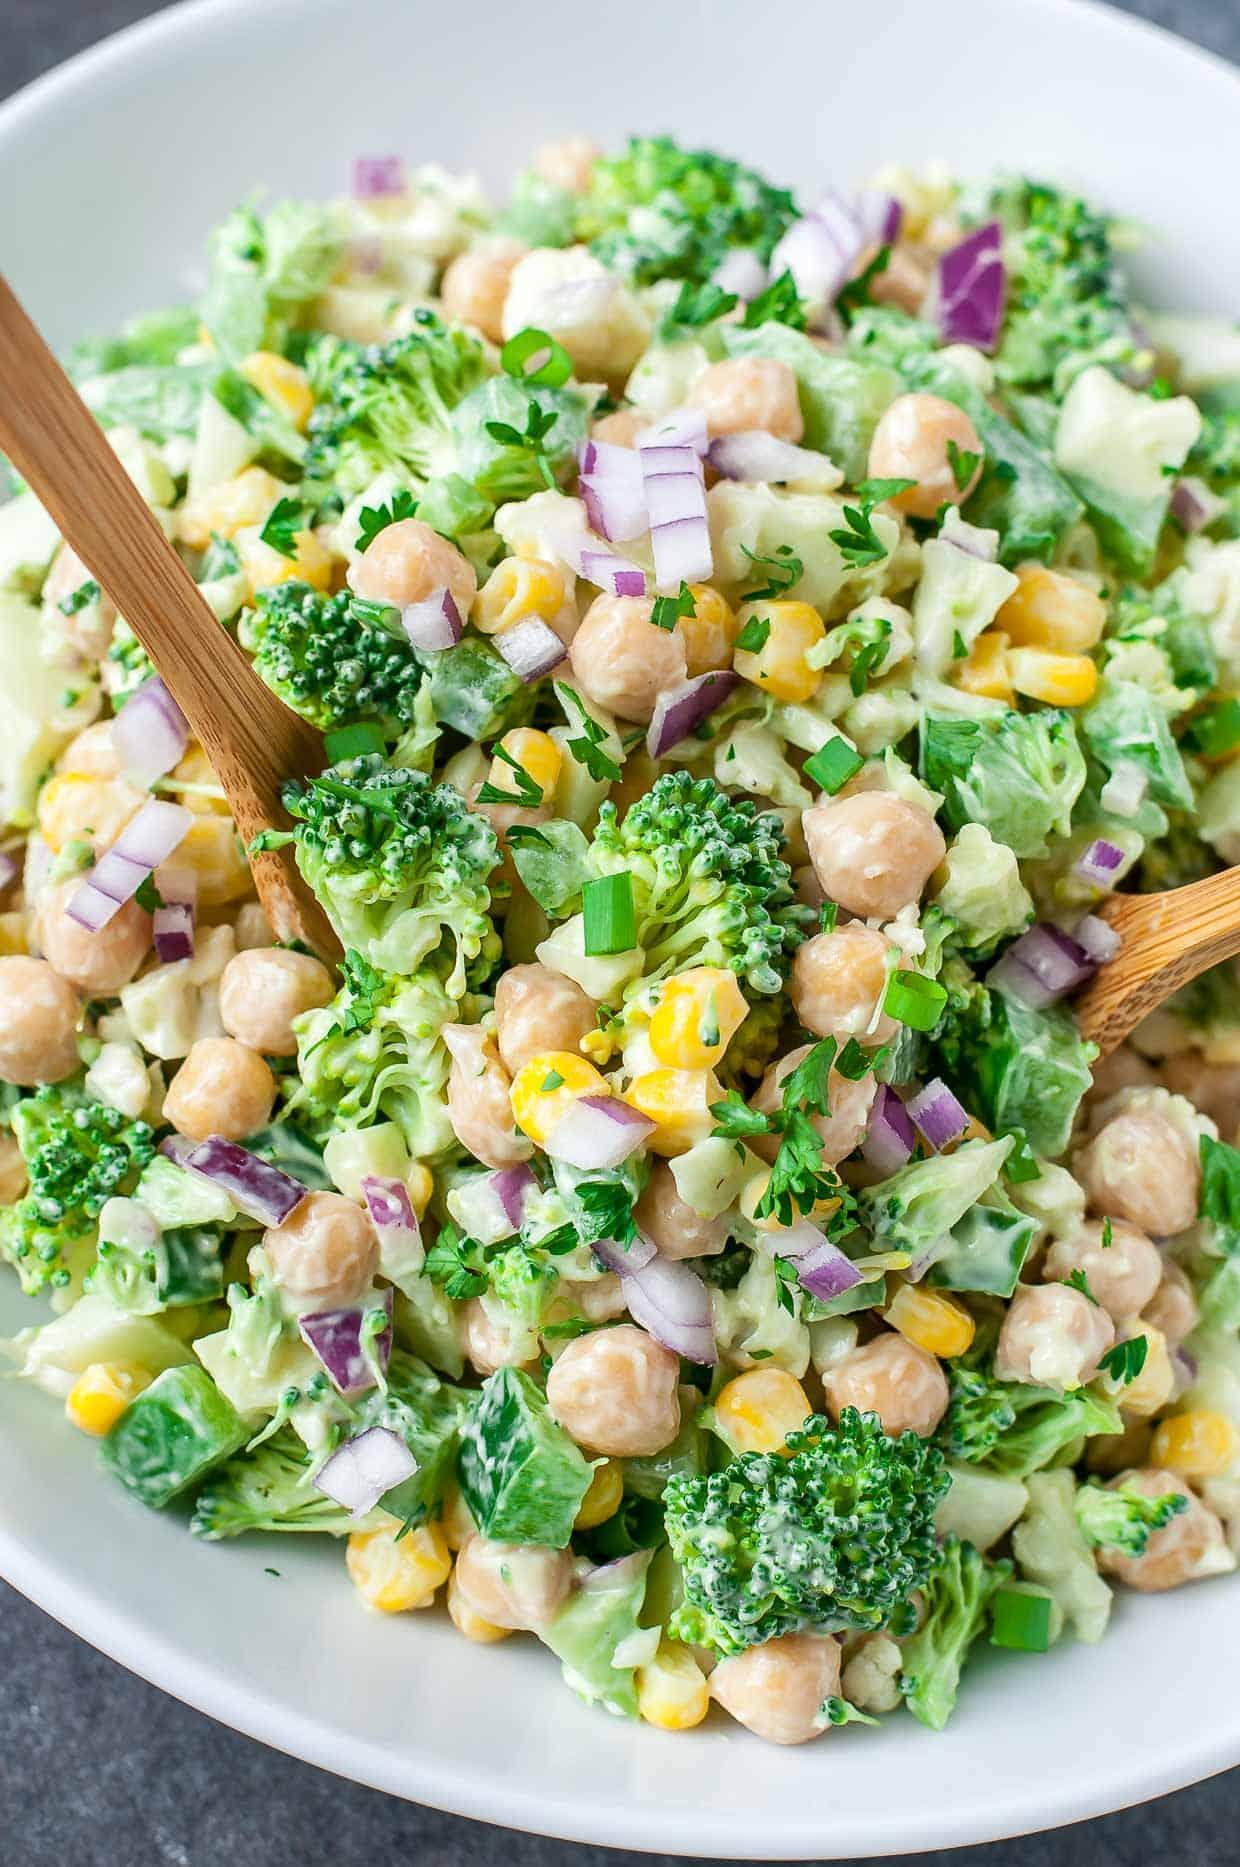 Chopped Cauliflower Broccoli Salad with Creamy Avocado Dressing